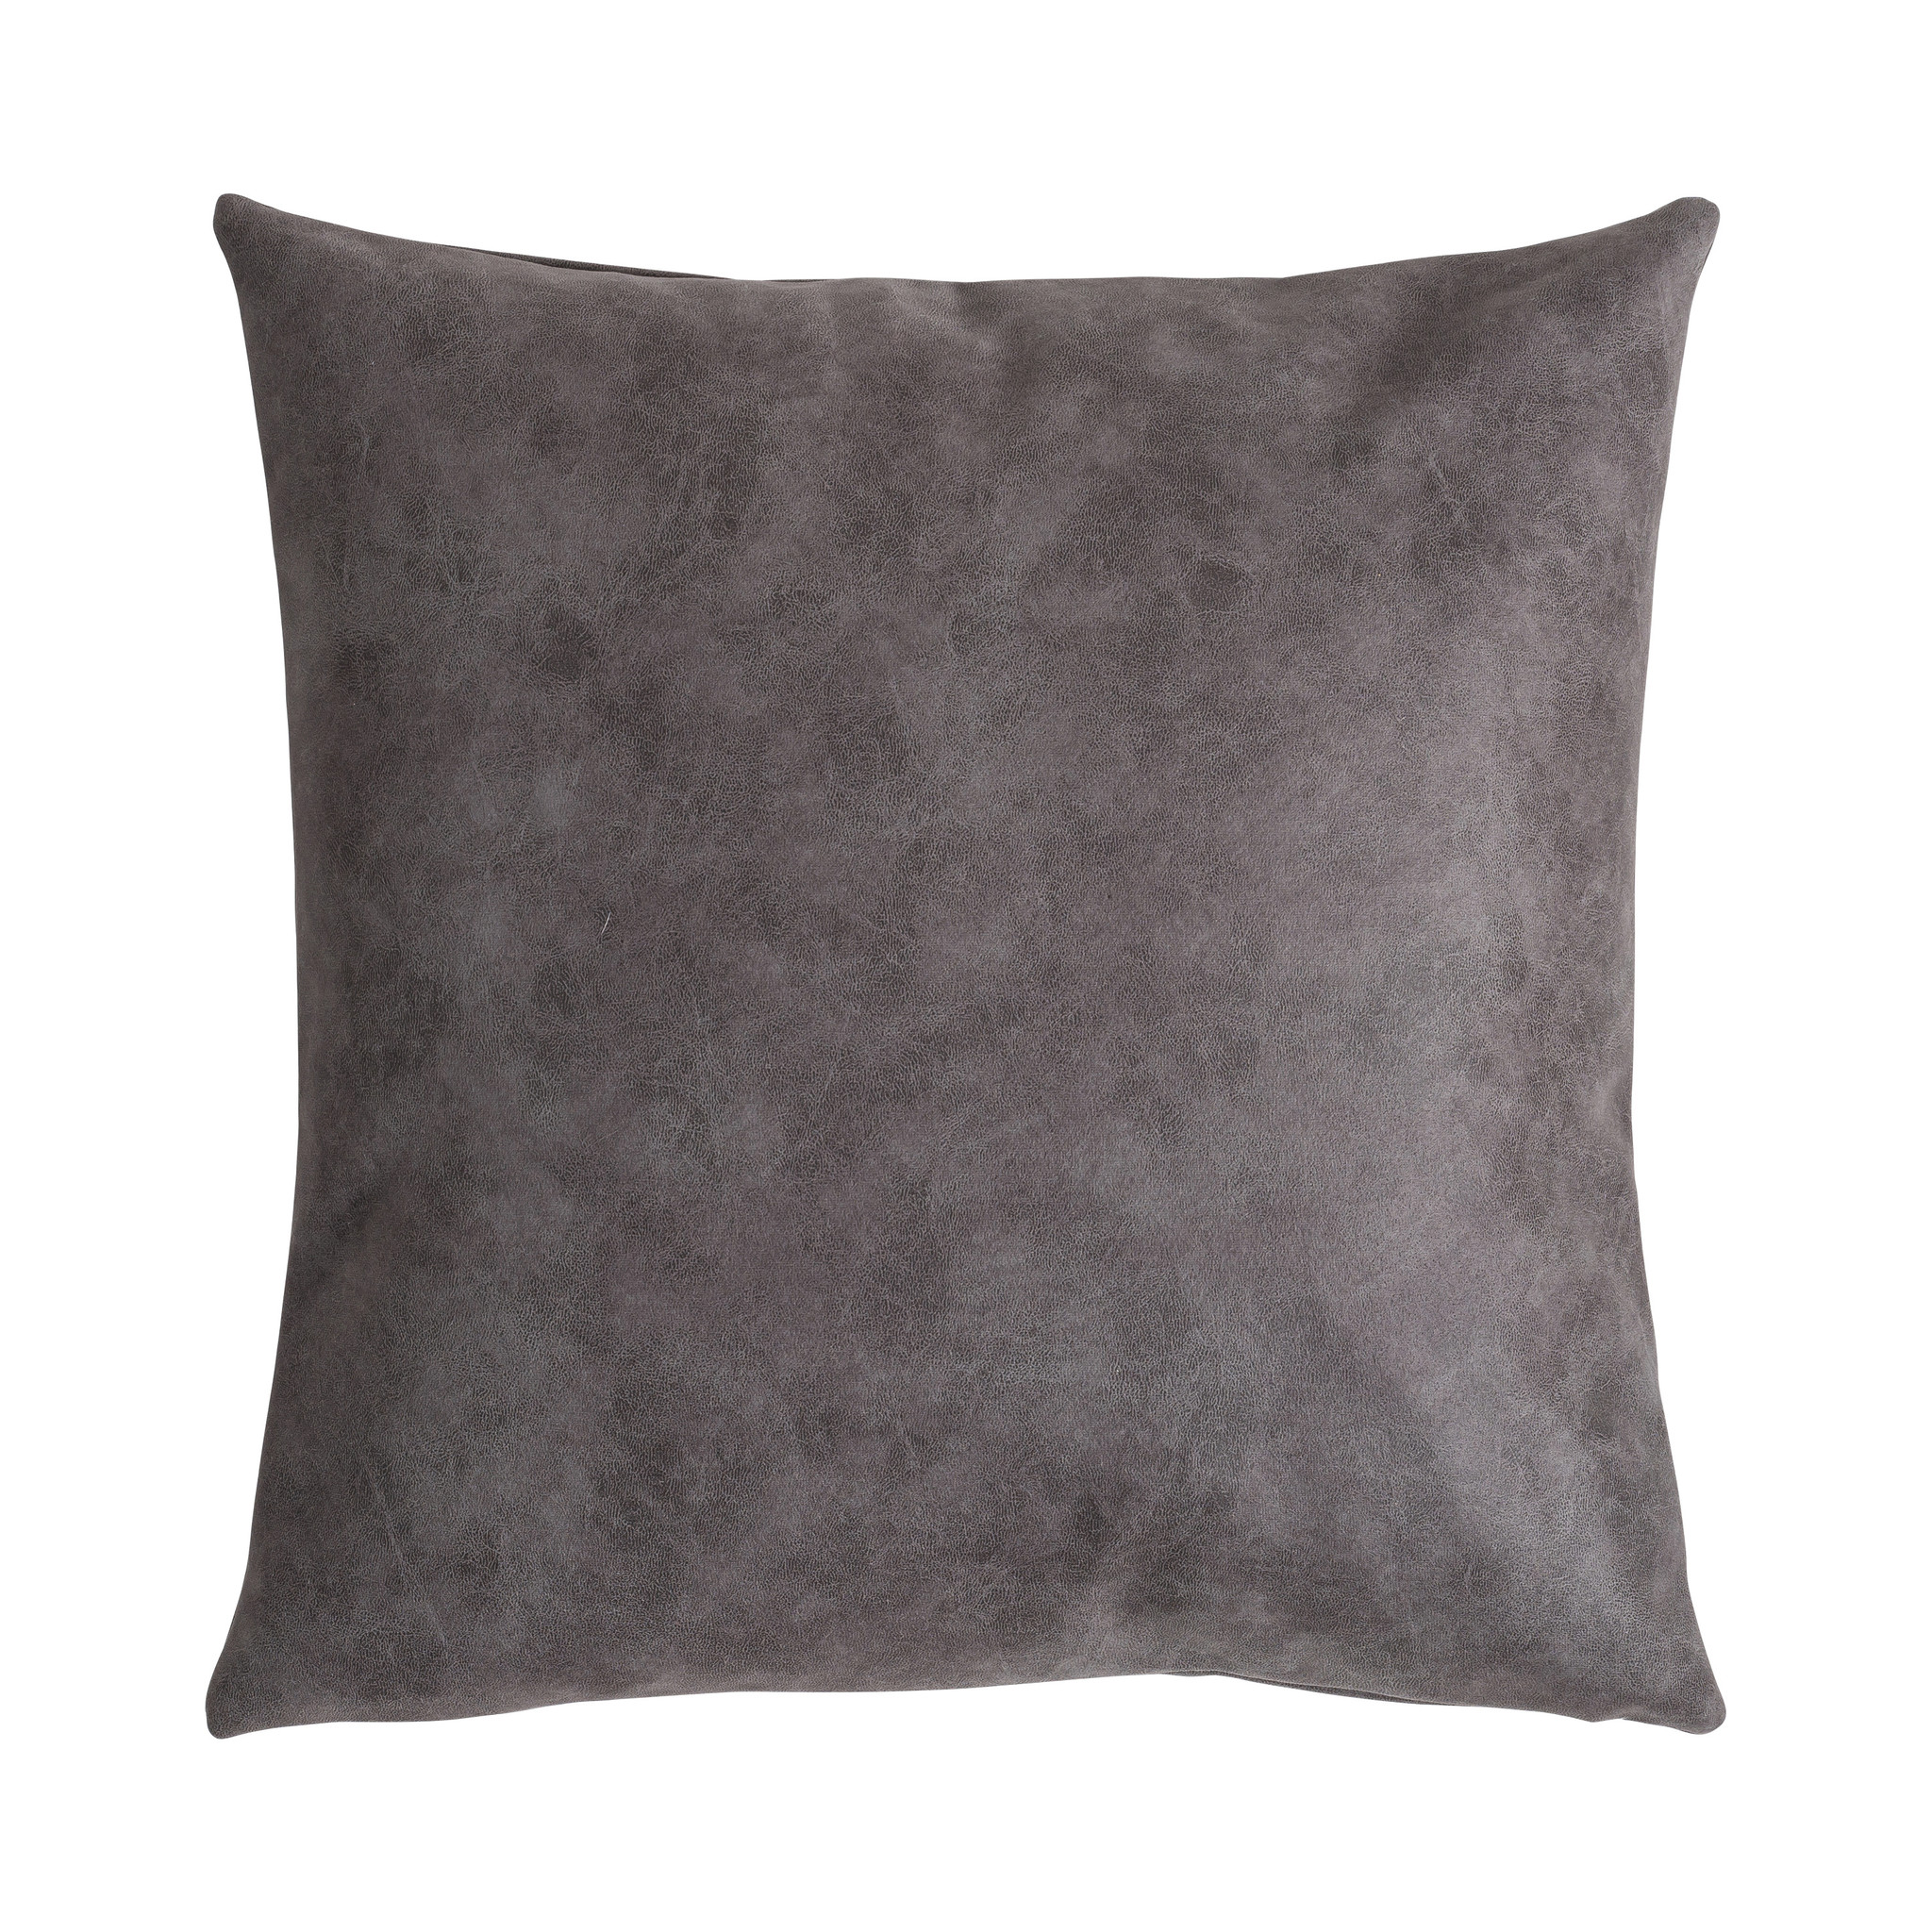 Presence Sierkussenhoes Zonca - Zilver 45 x 45 cm